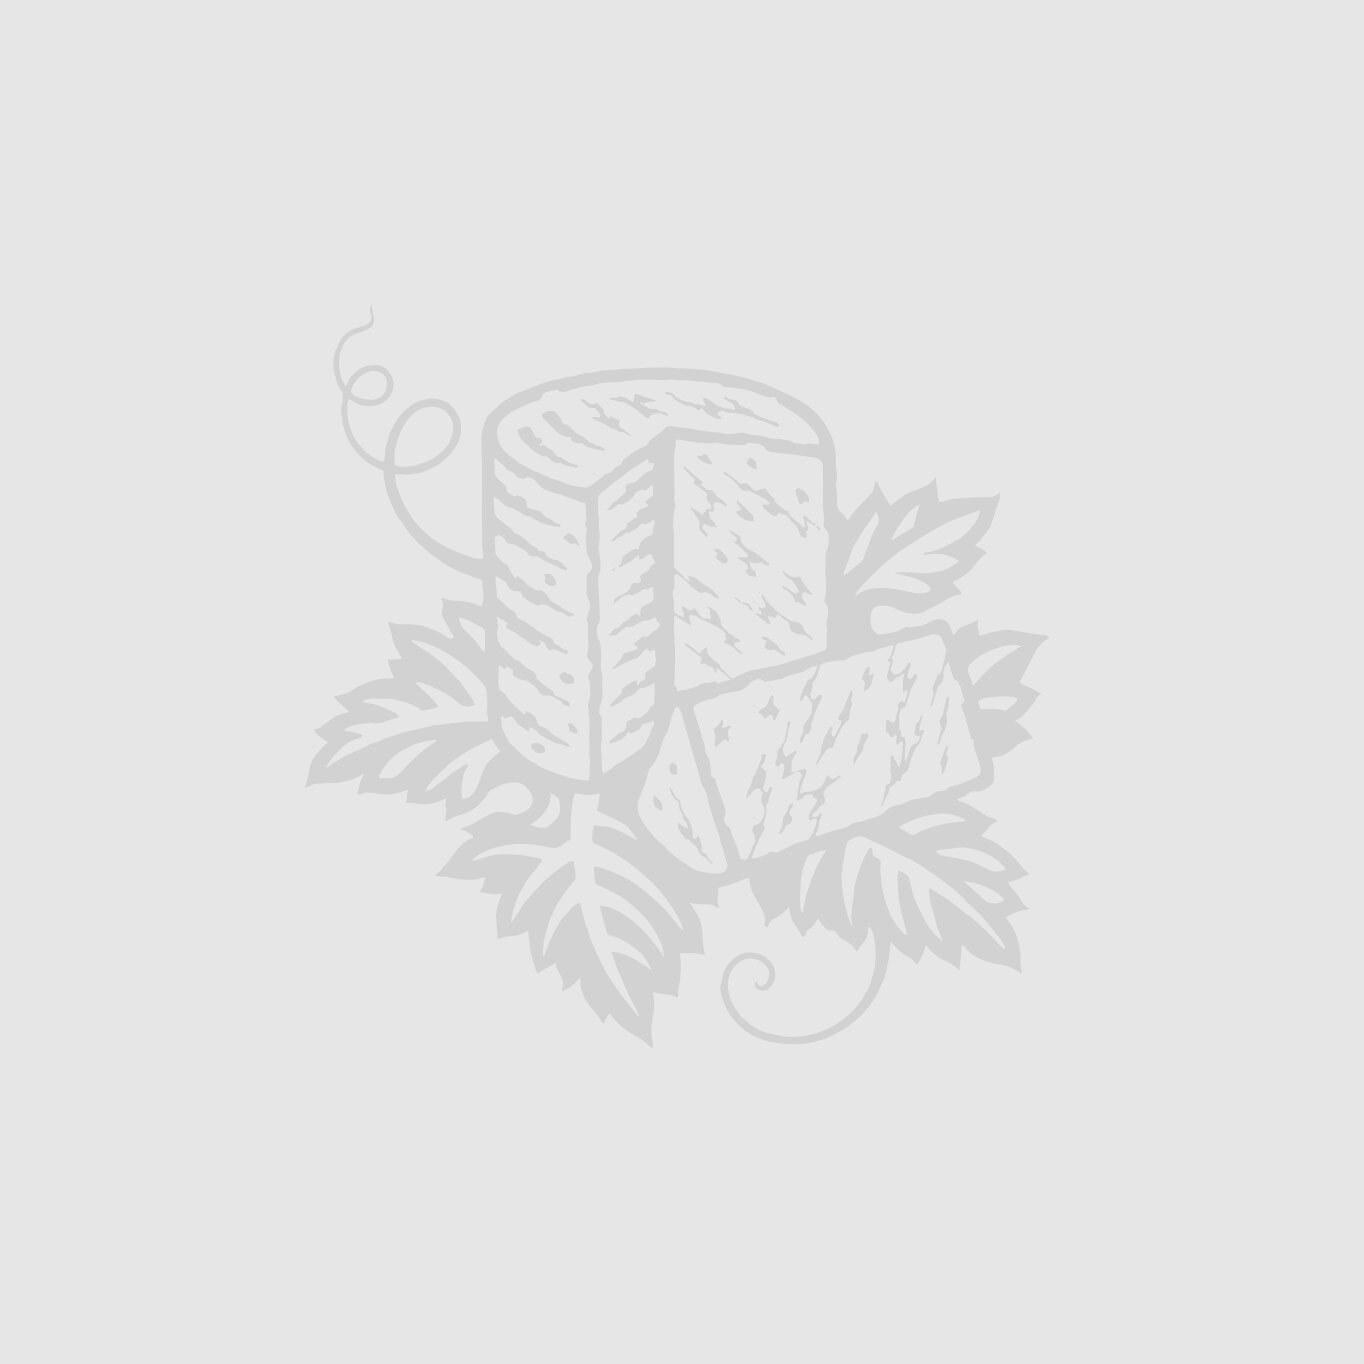 Loison Farfalle Classic Colomba A.D. 1552 750g